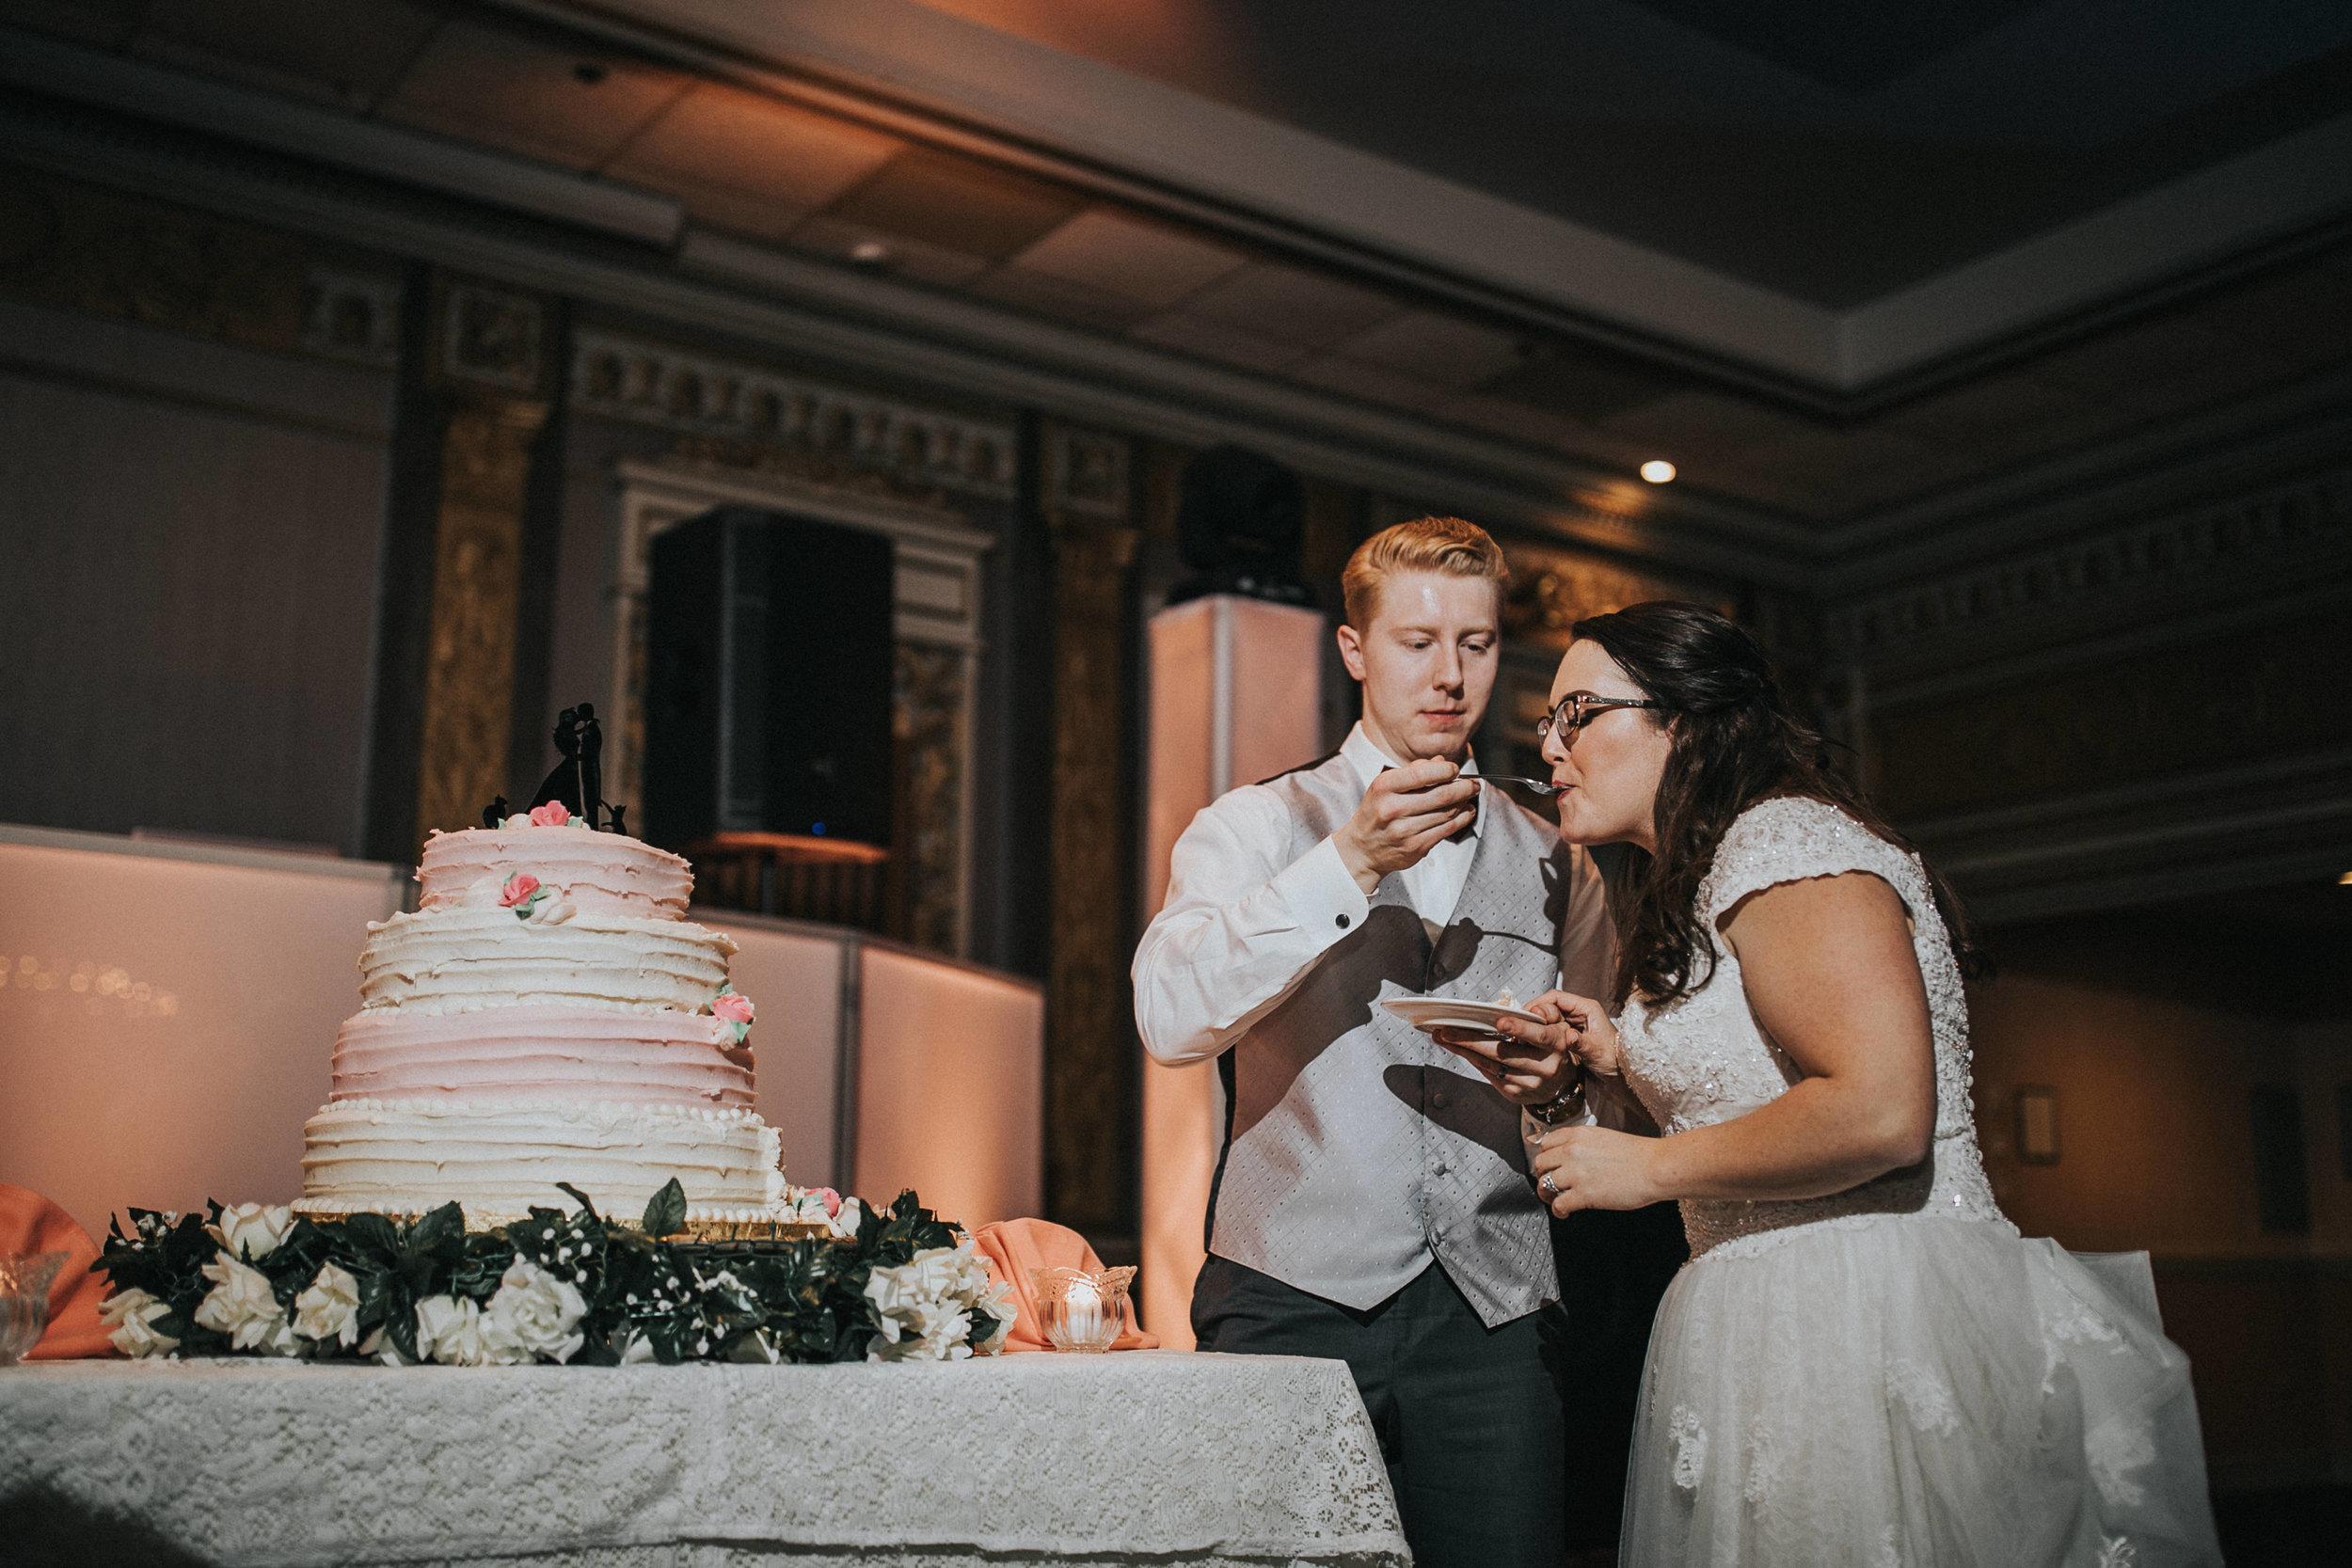 New-Jersey-Wedding-Photography-Fishers-Tudor-House-JennaLynnPhotography-Reception-Kathleen&Eddie-245.jpg